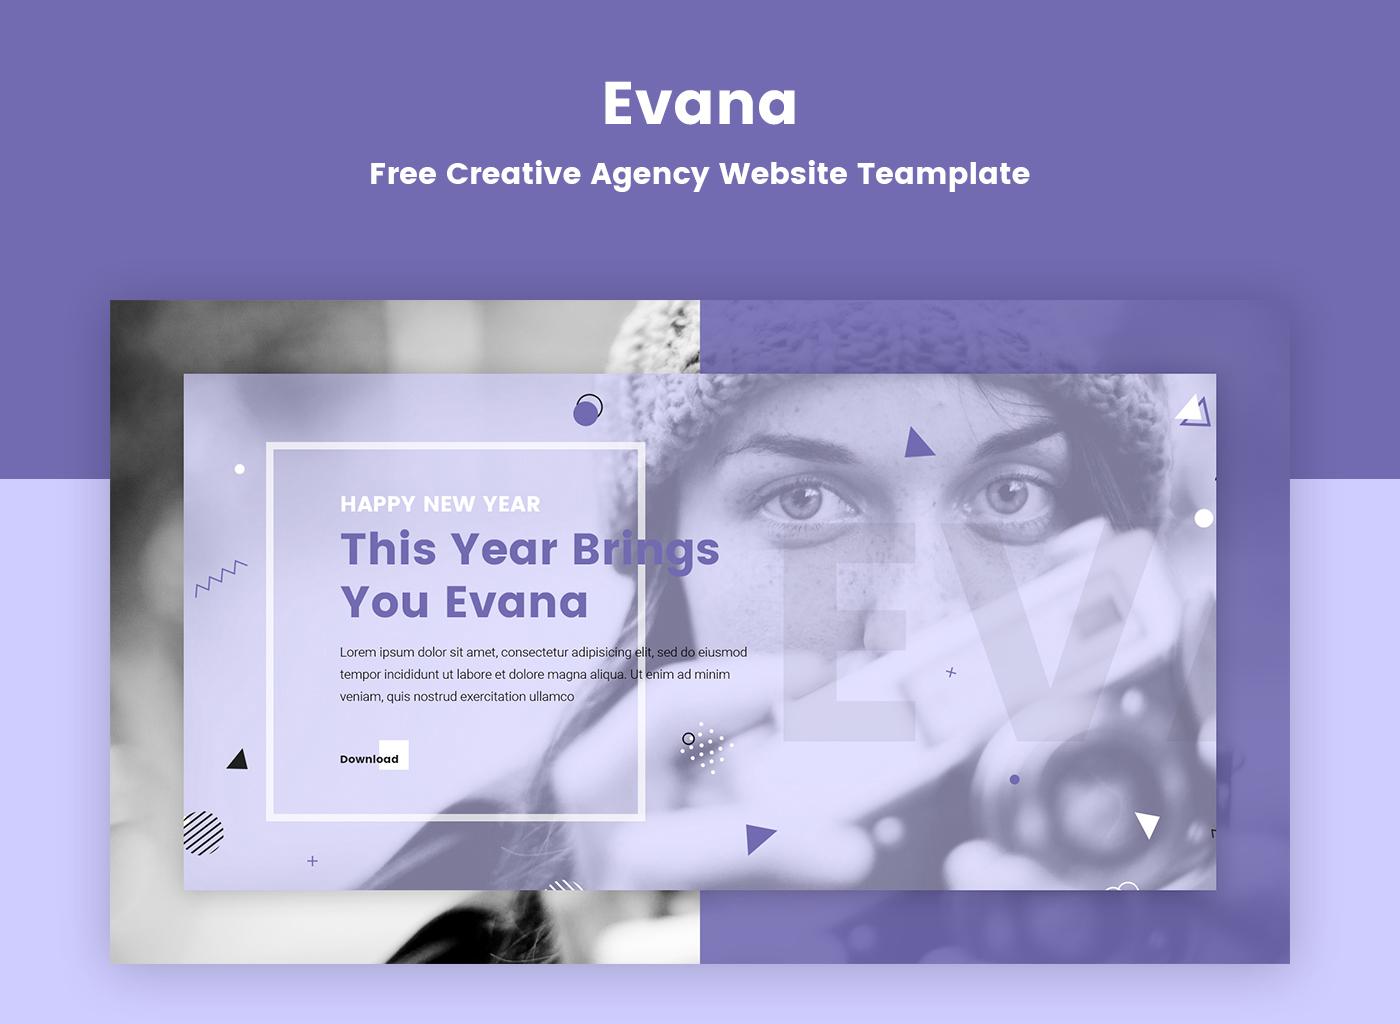 Creative Design creative agency creative design agency Free psd template Psd Template Freebie